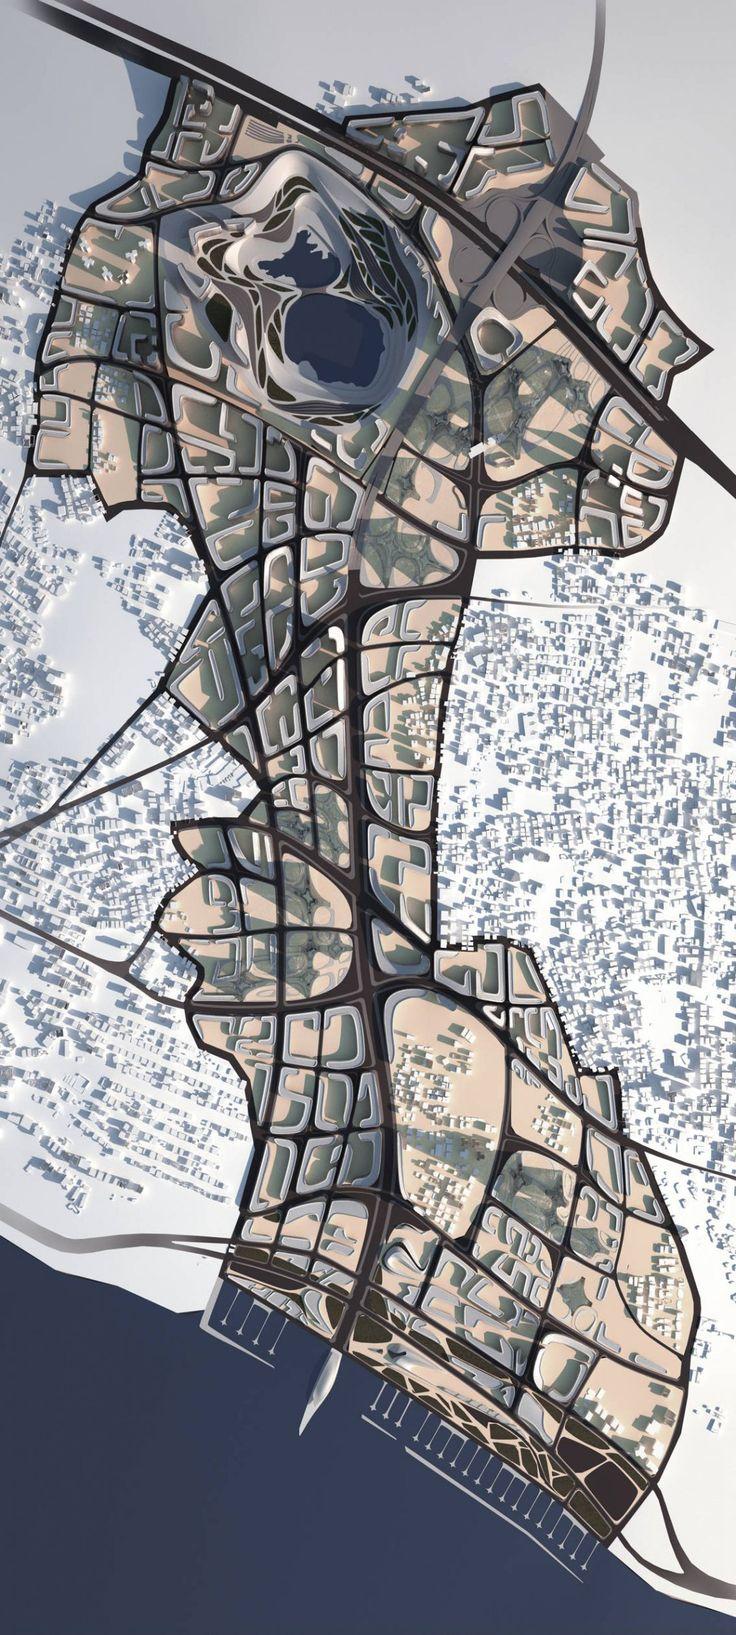 Zaha Hadid (1950 – 2016) Architects | Kartal Masterplan | Istanbul, Turkey | 2006 | http://www.zaha-hadid.com